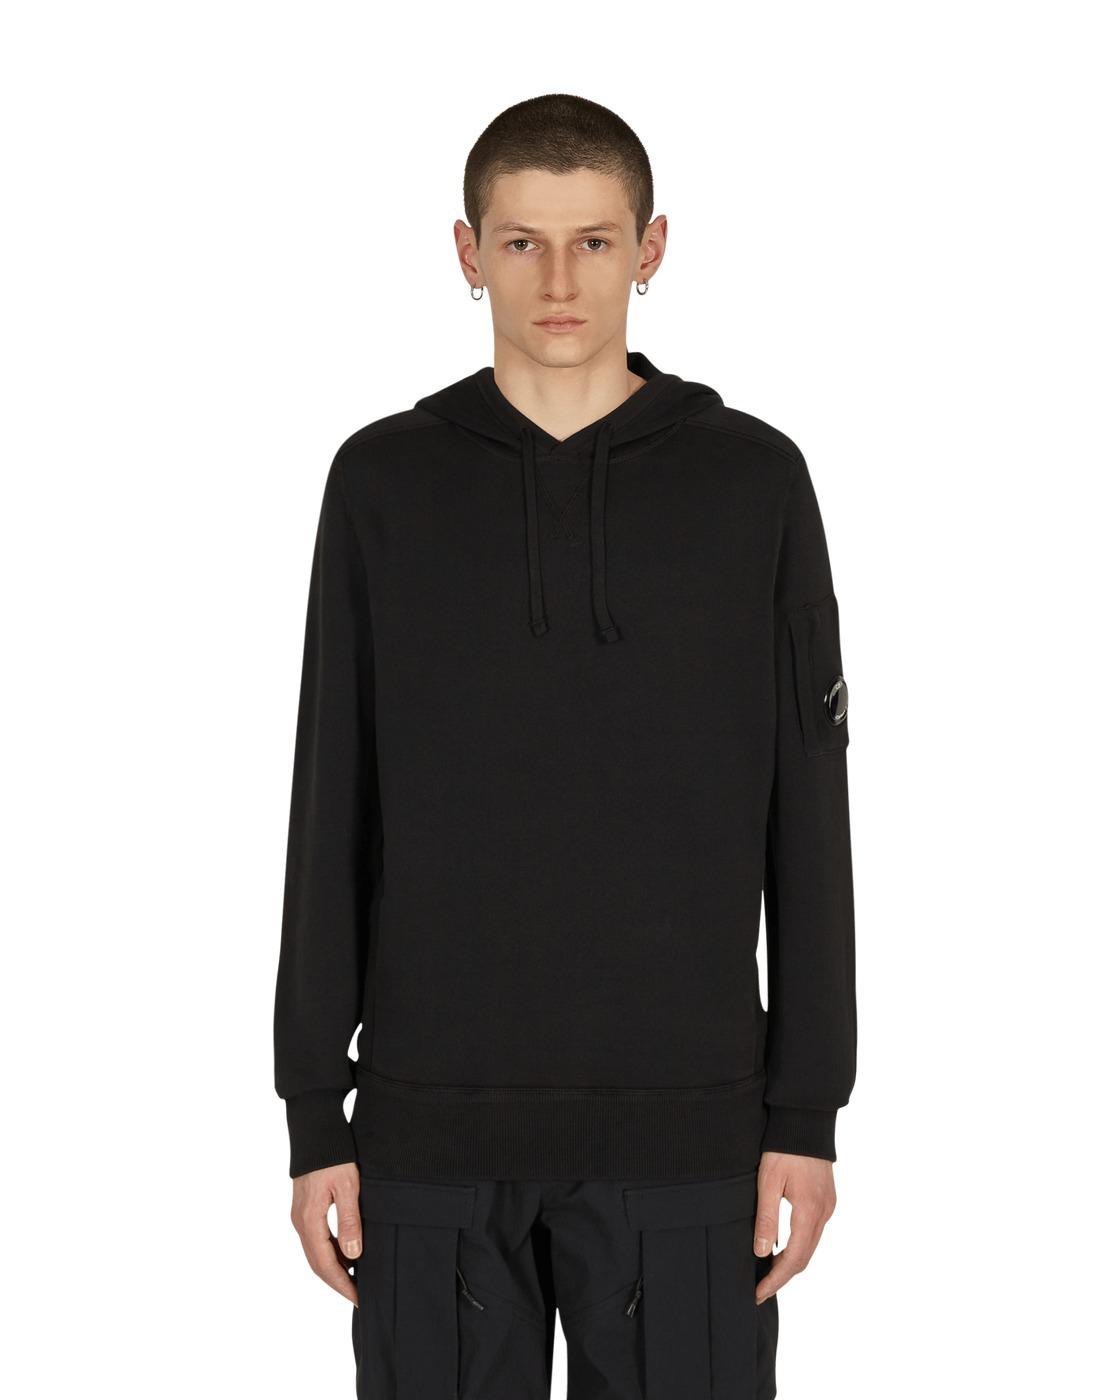 C.P. Company Hooded Sweatshirt Black